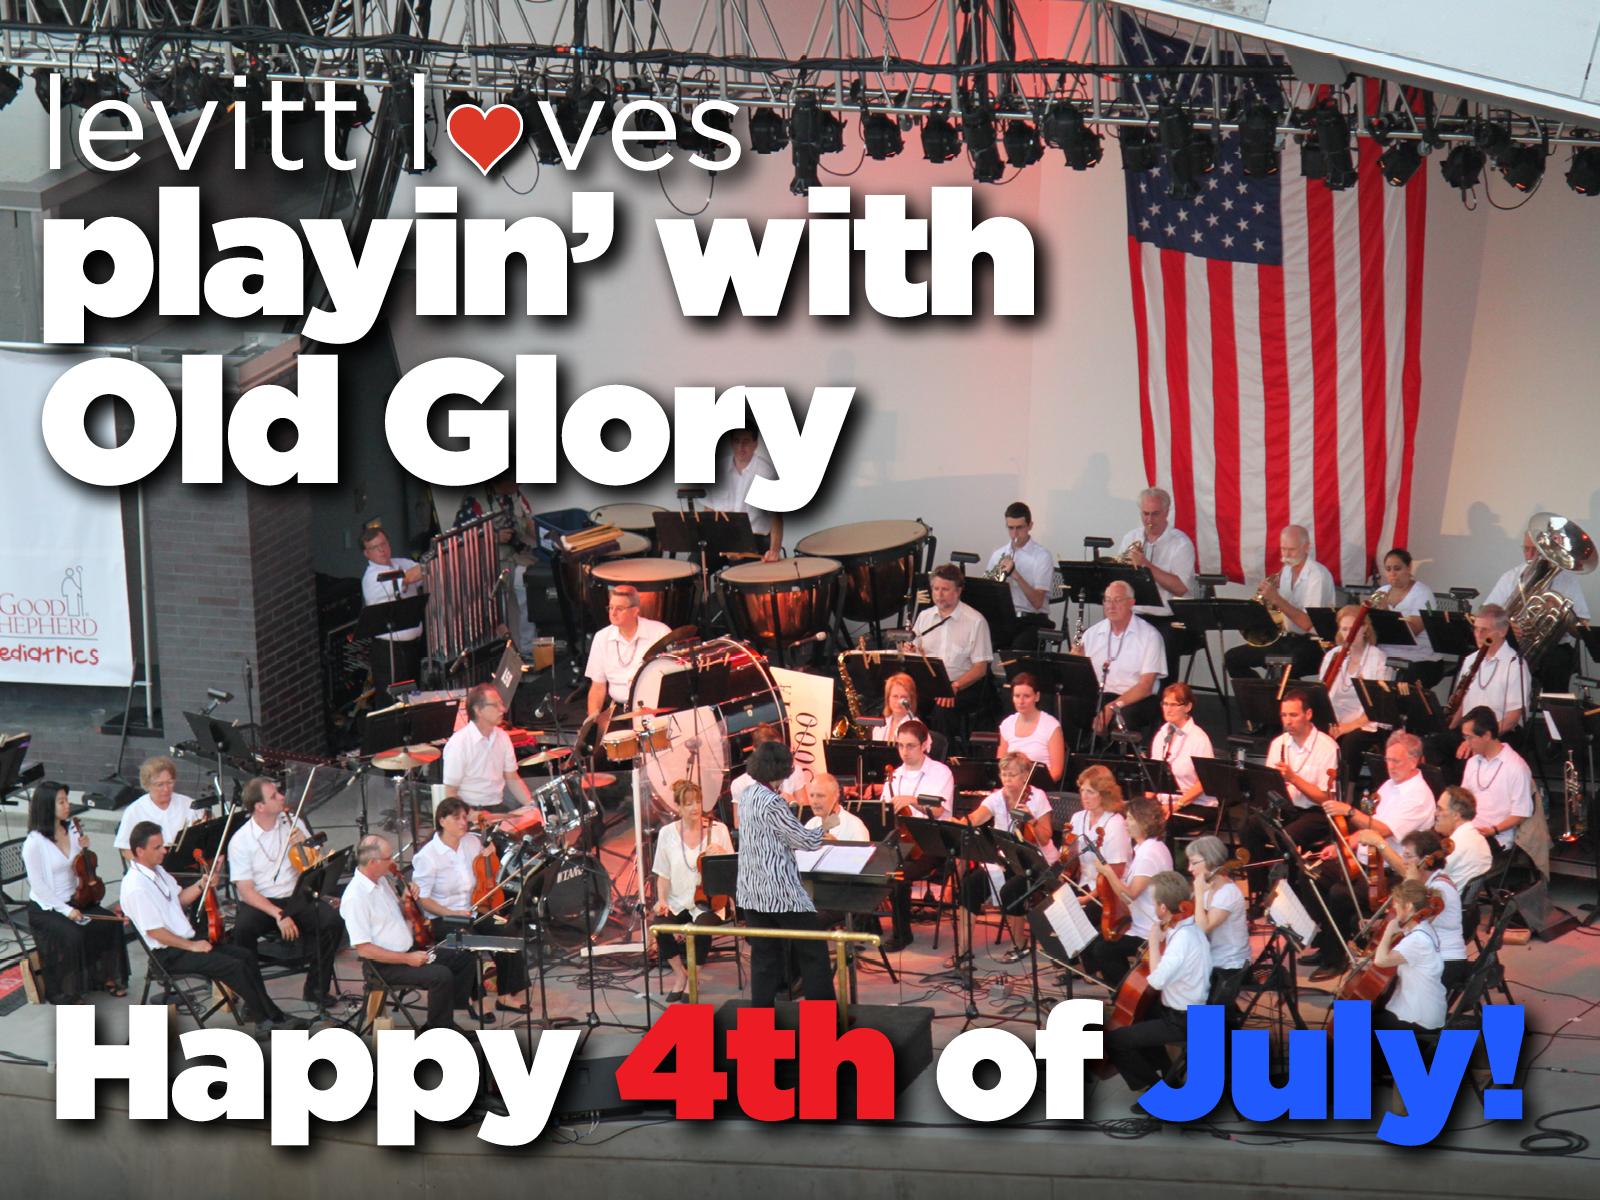 Levitt loves_July4